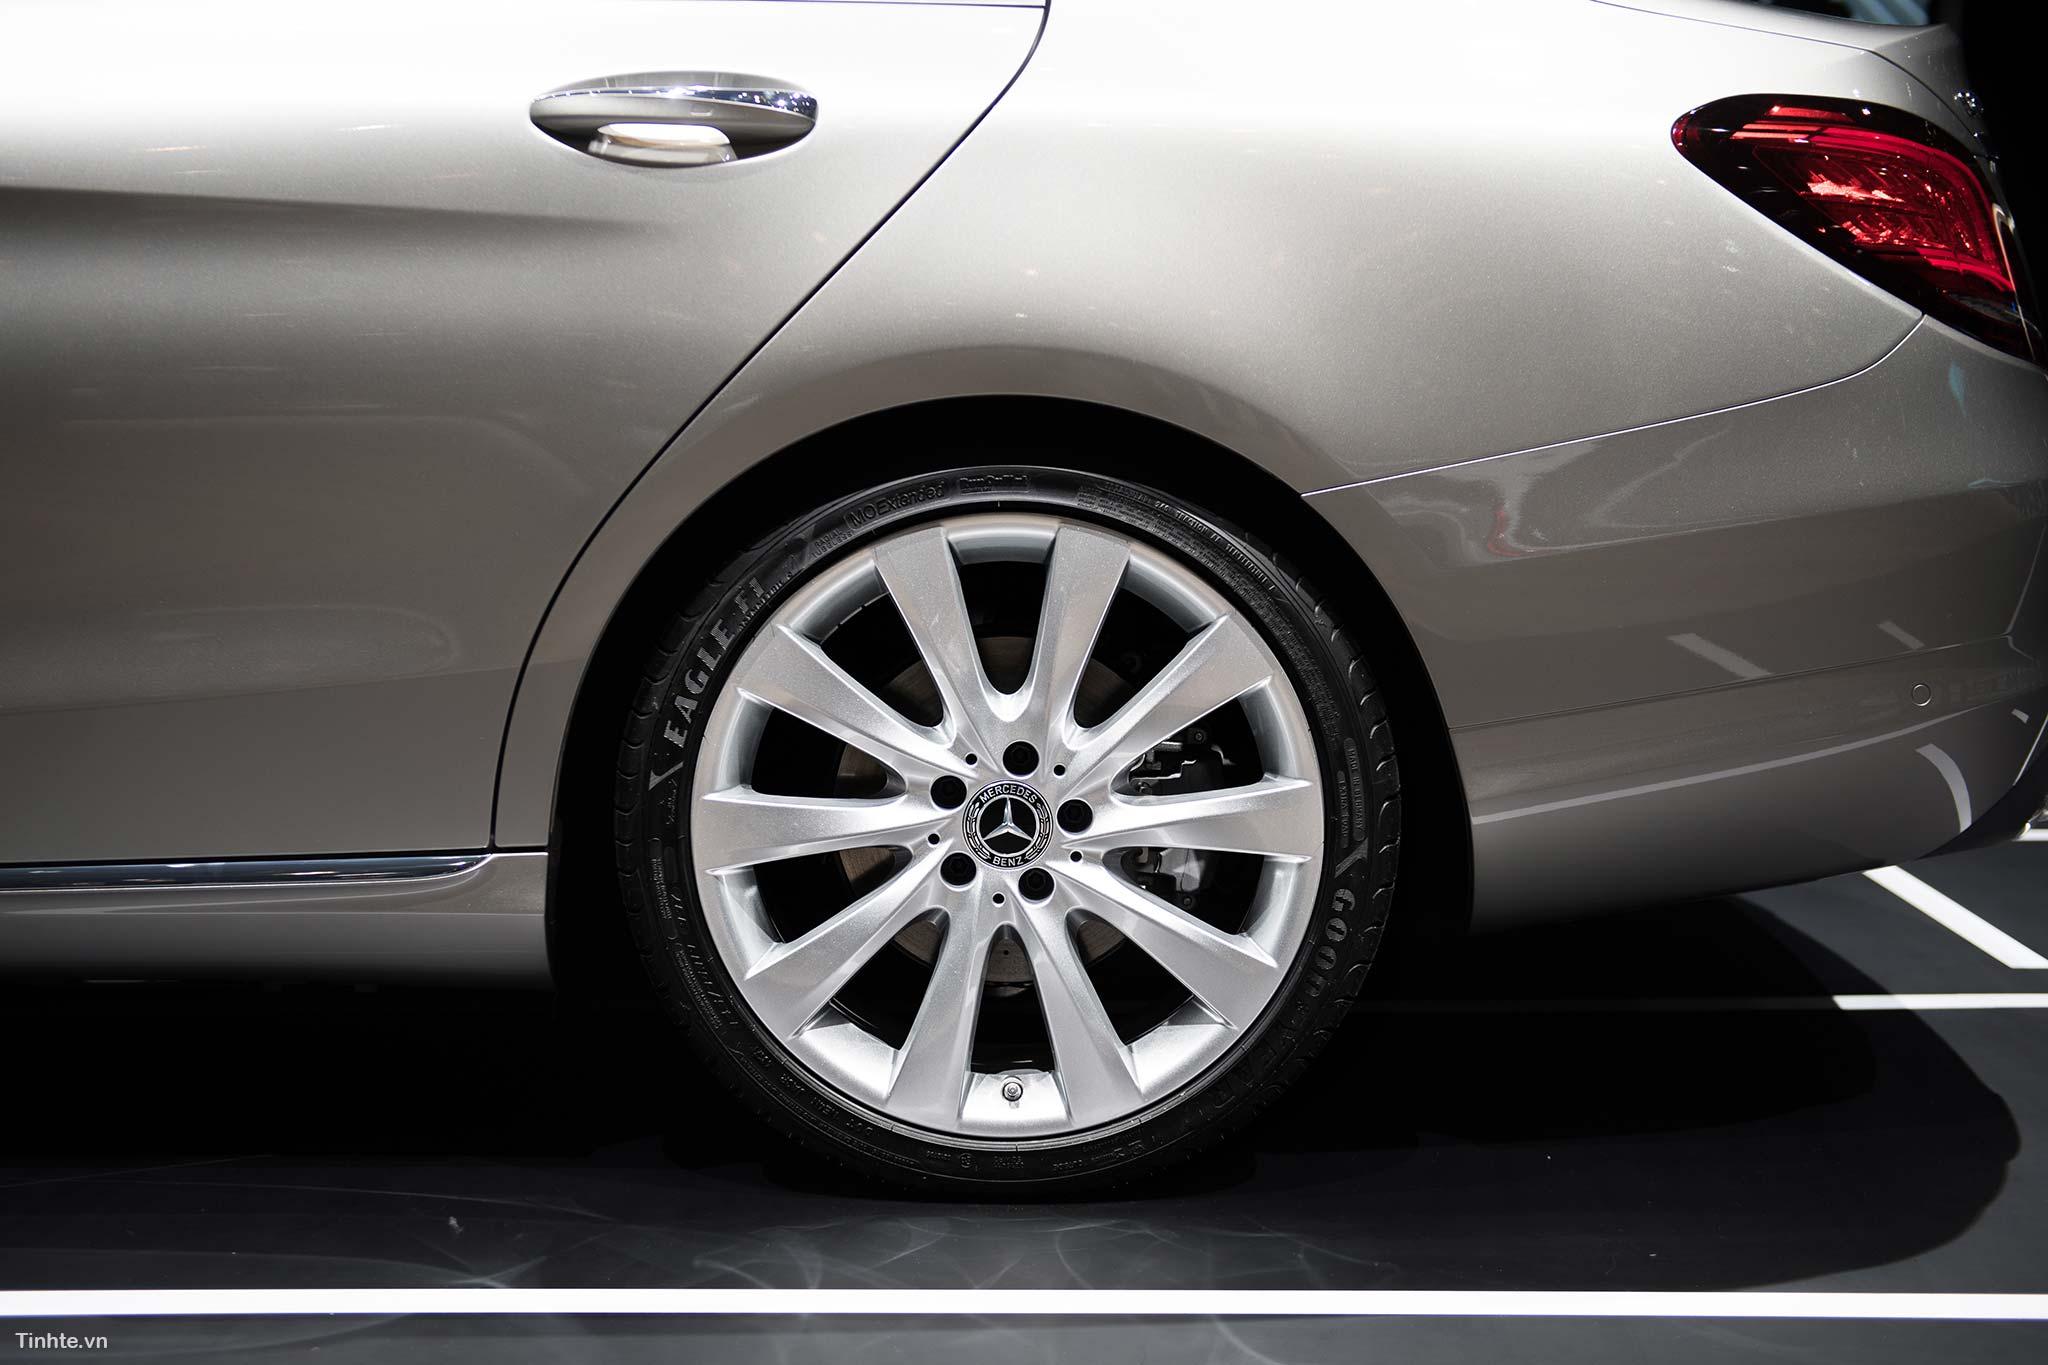 tinhte_Mercedes-Benz-C-200-4MATIC-13.jpg